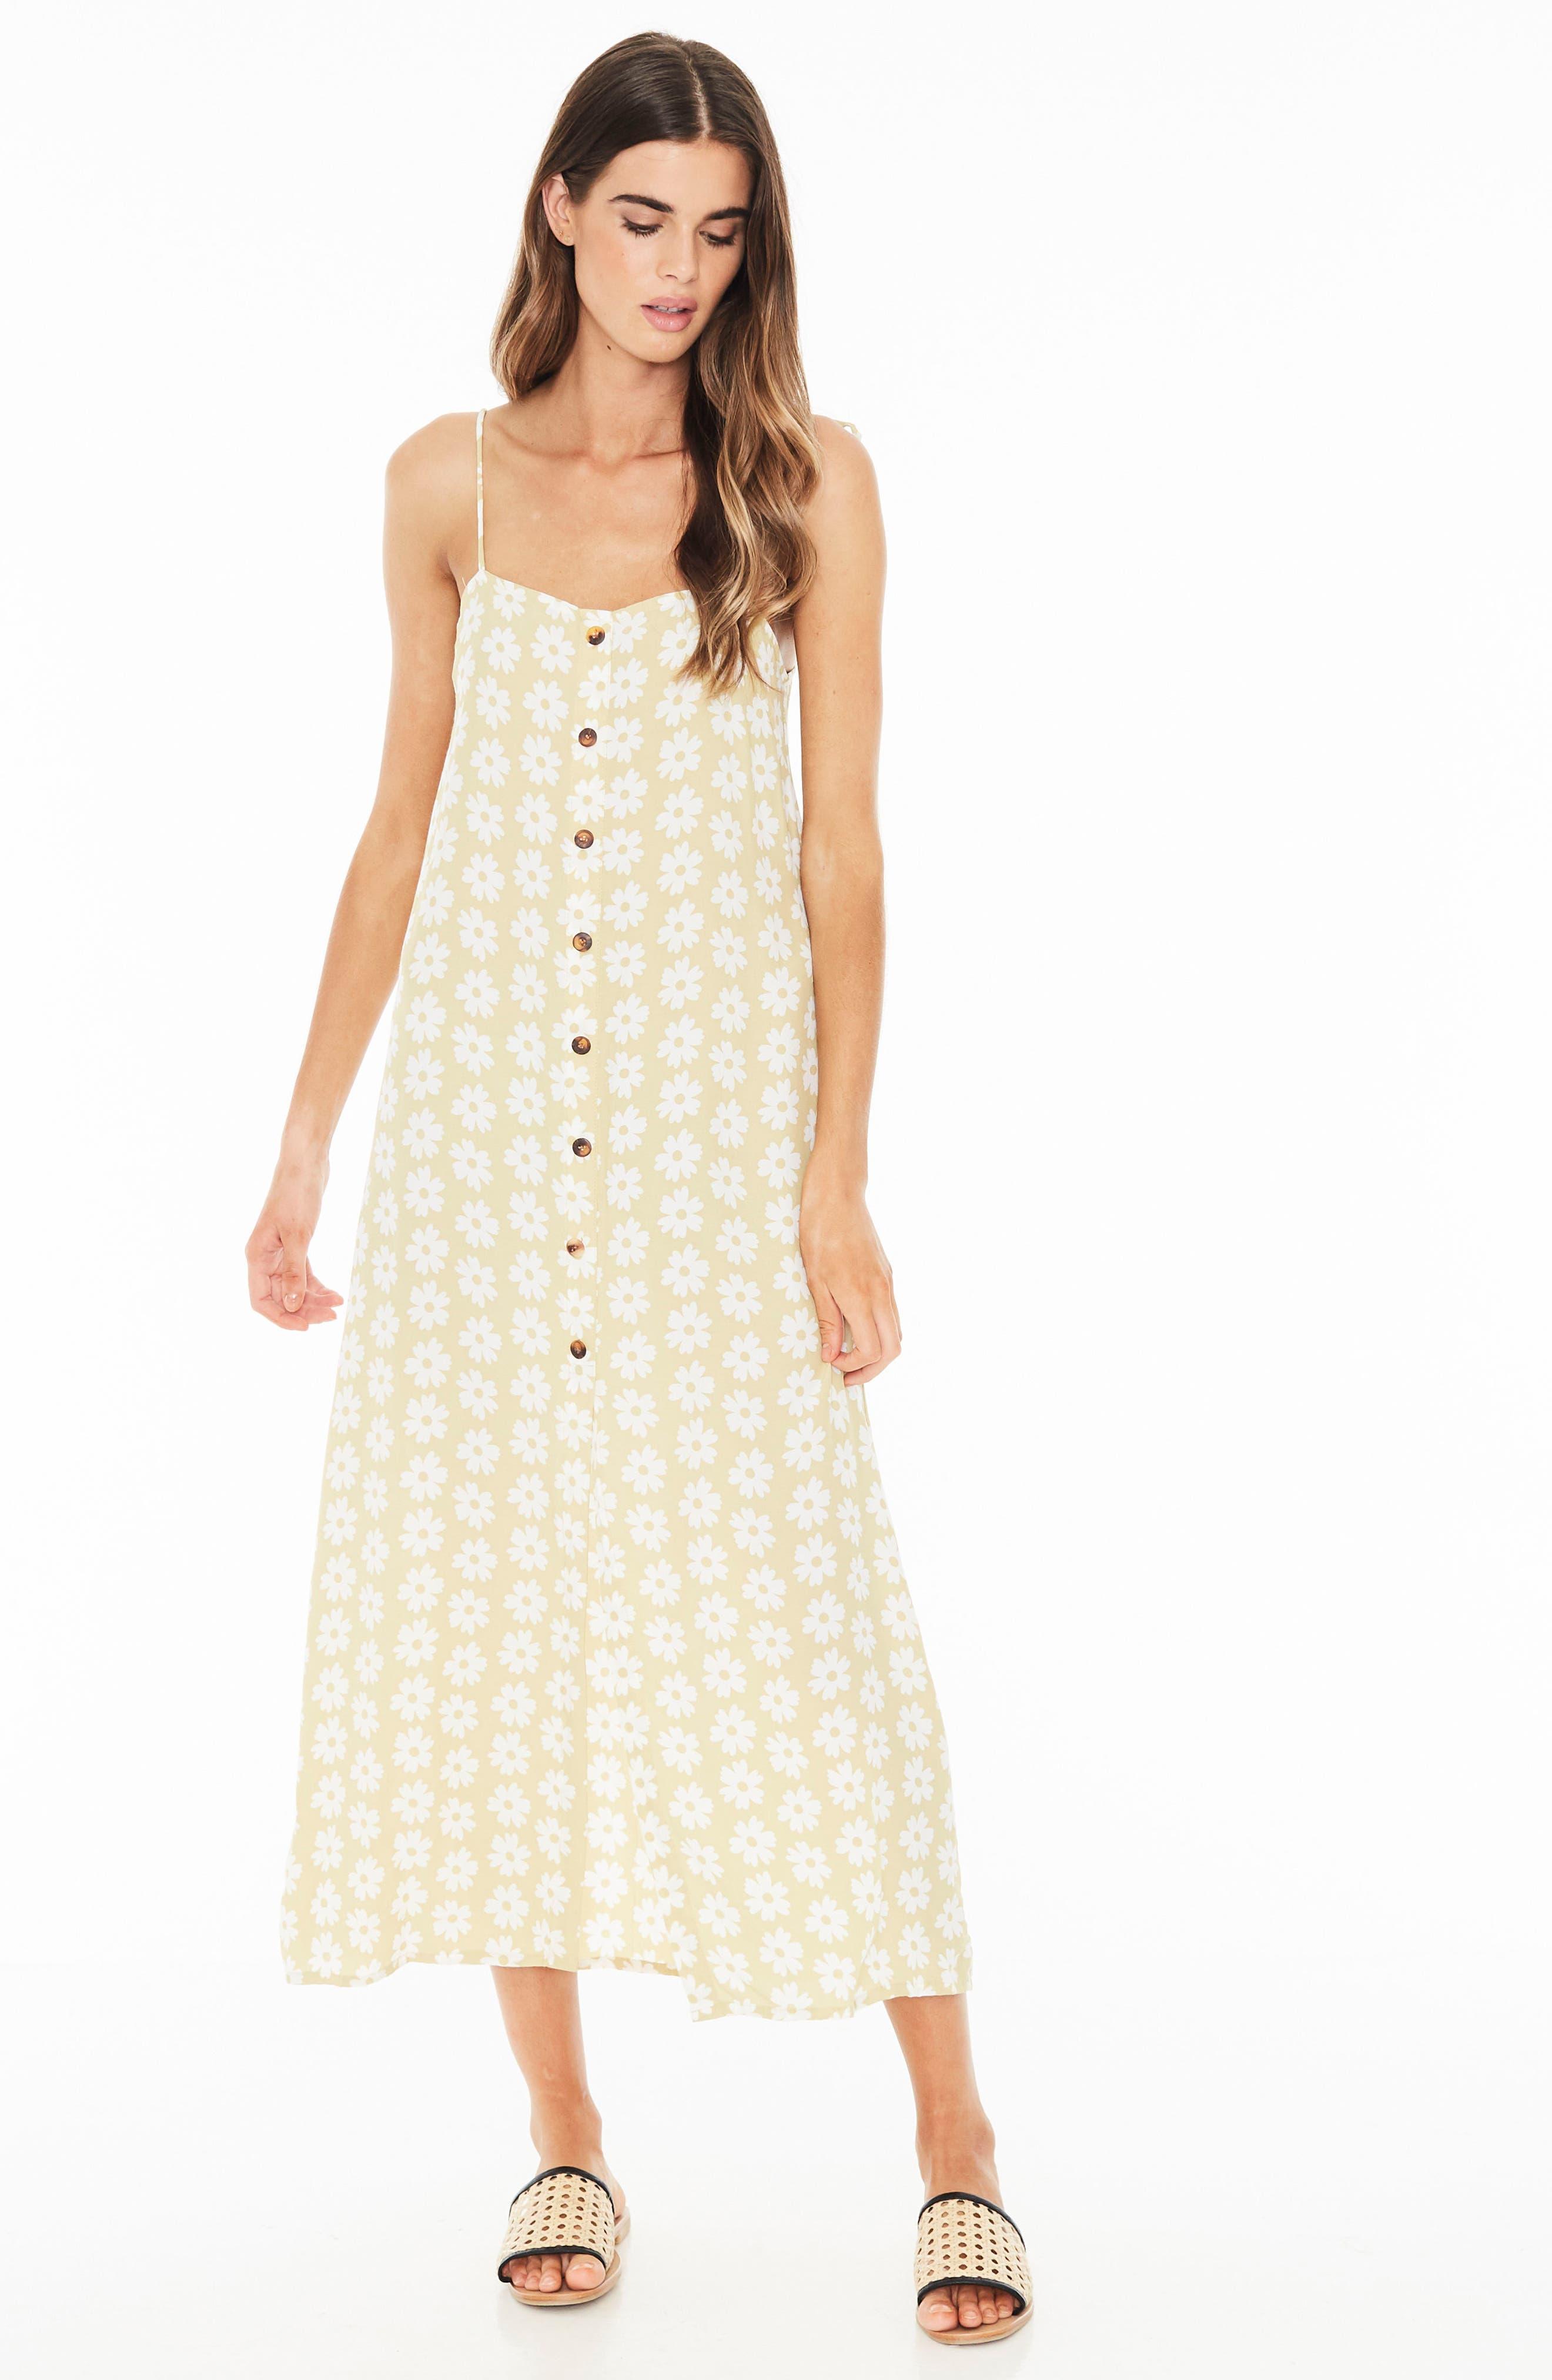 Arrieta Midi Dress,                             Main thumbnail 1, color,                             701